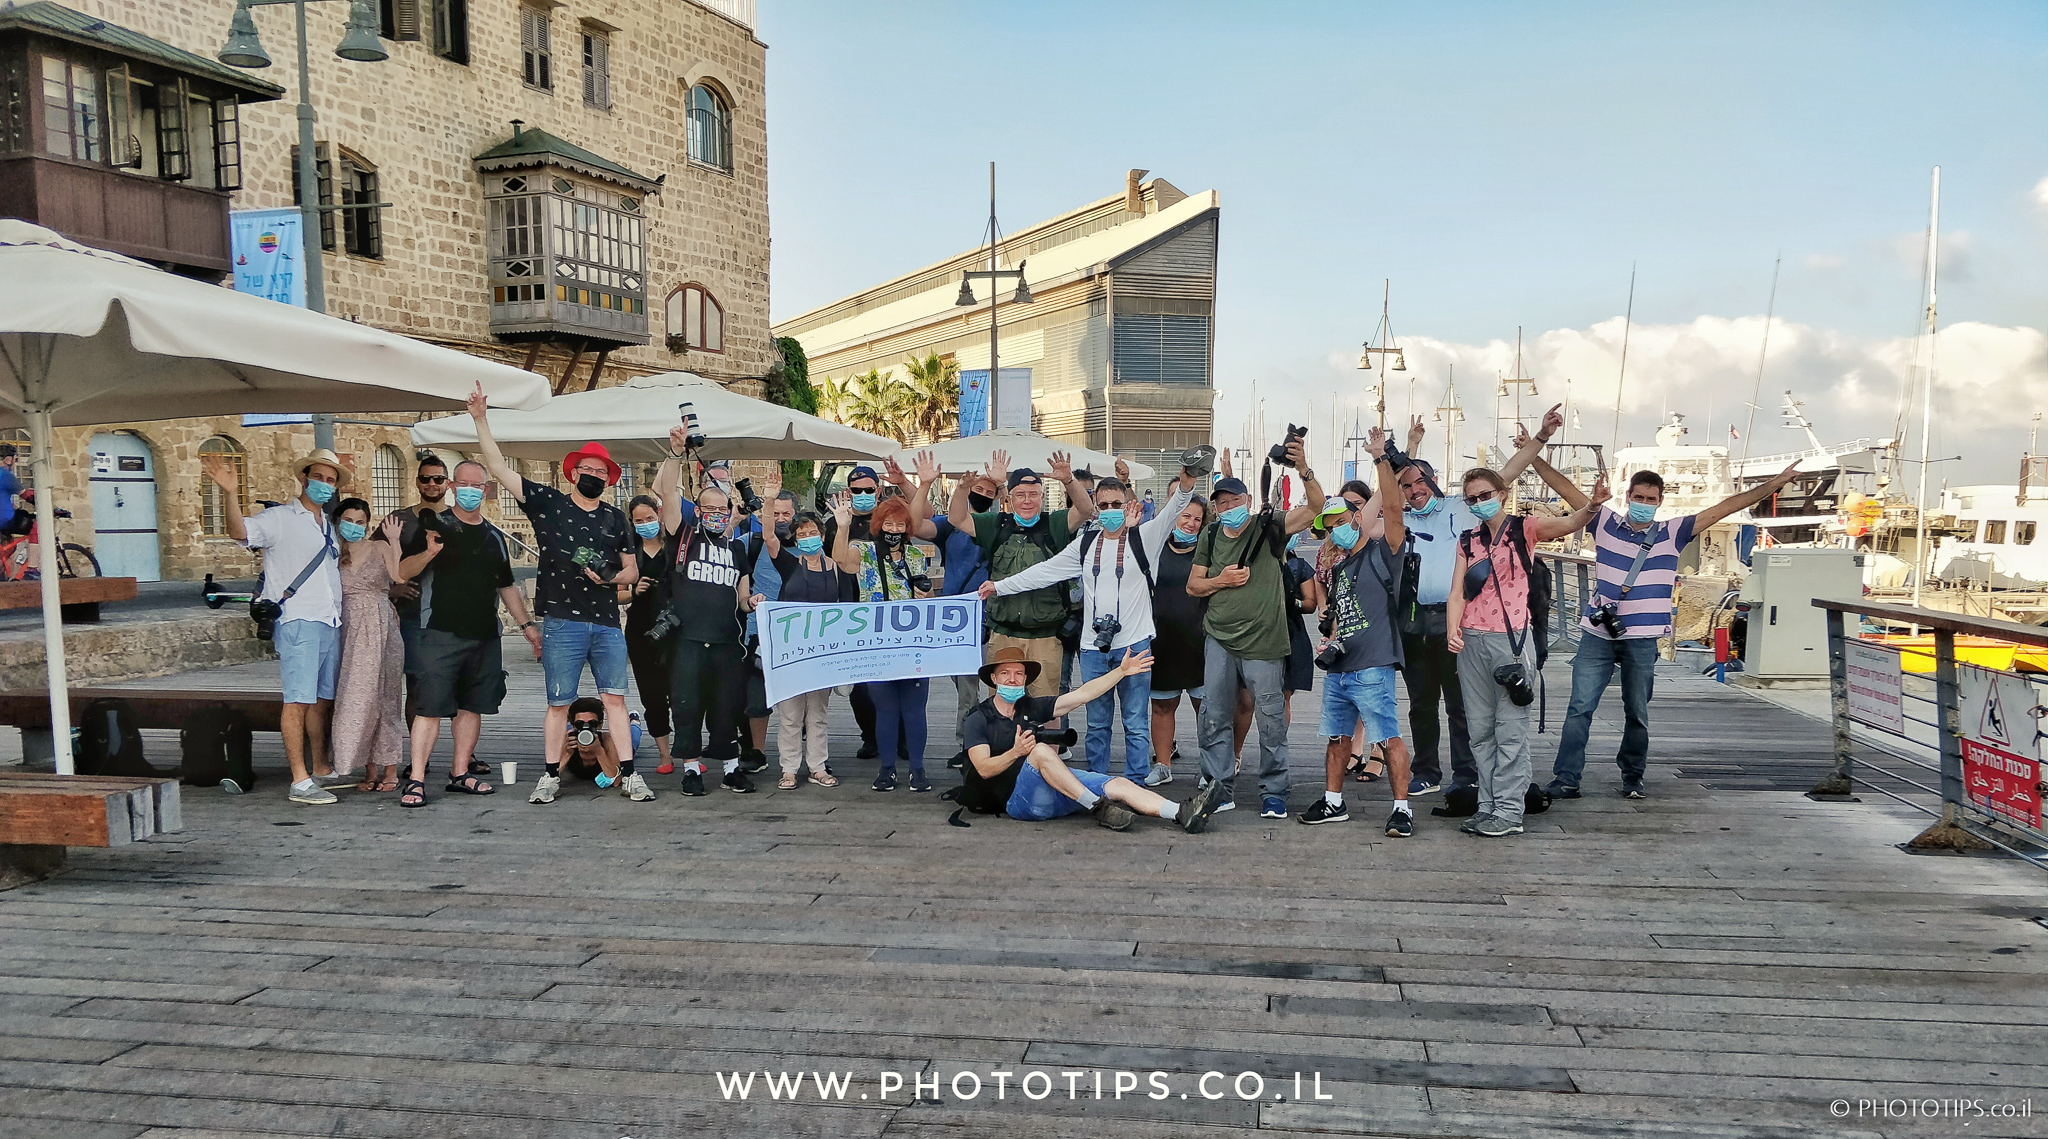 20200821 - PhotoTips Workshops w Flag -